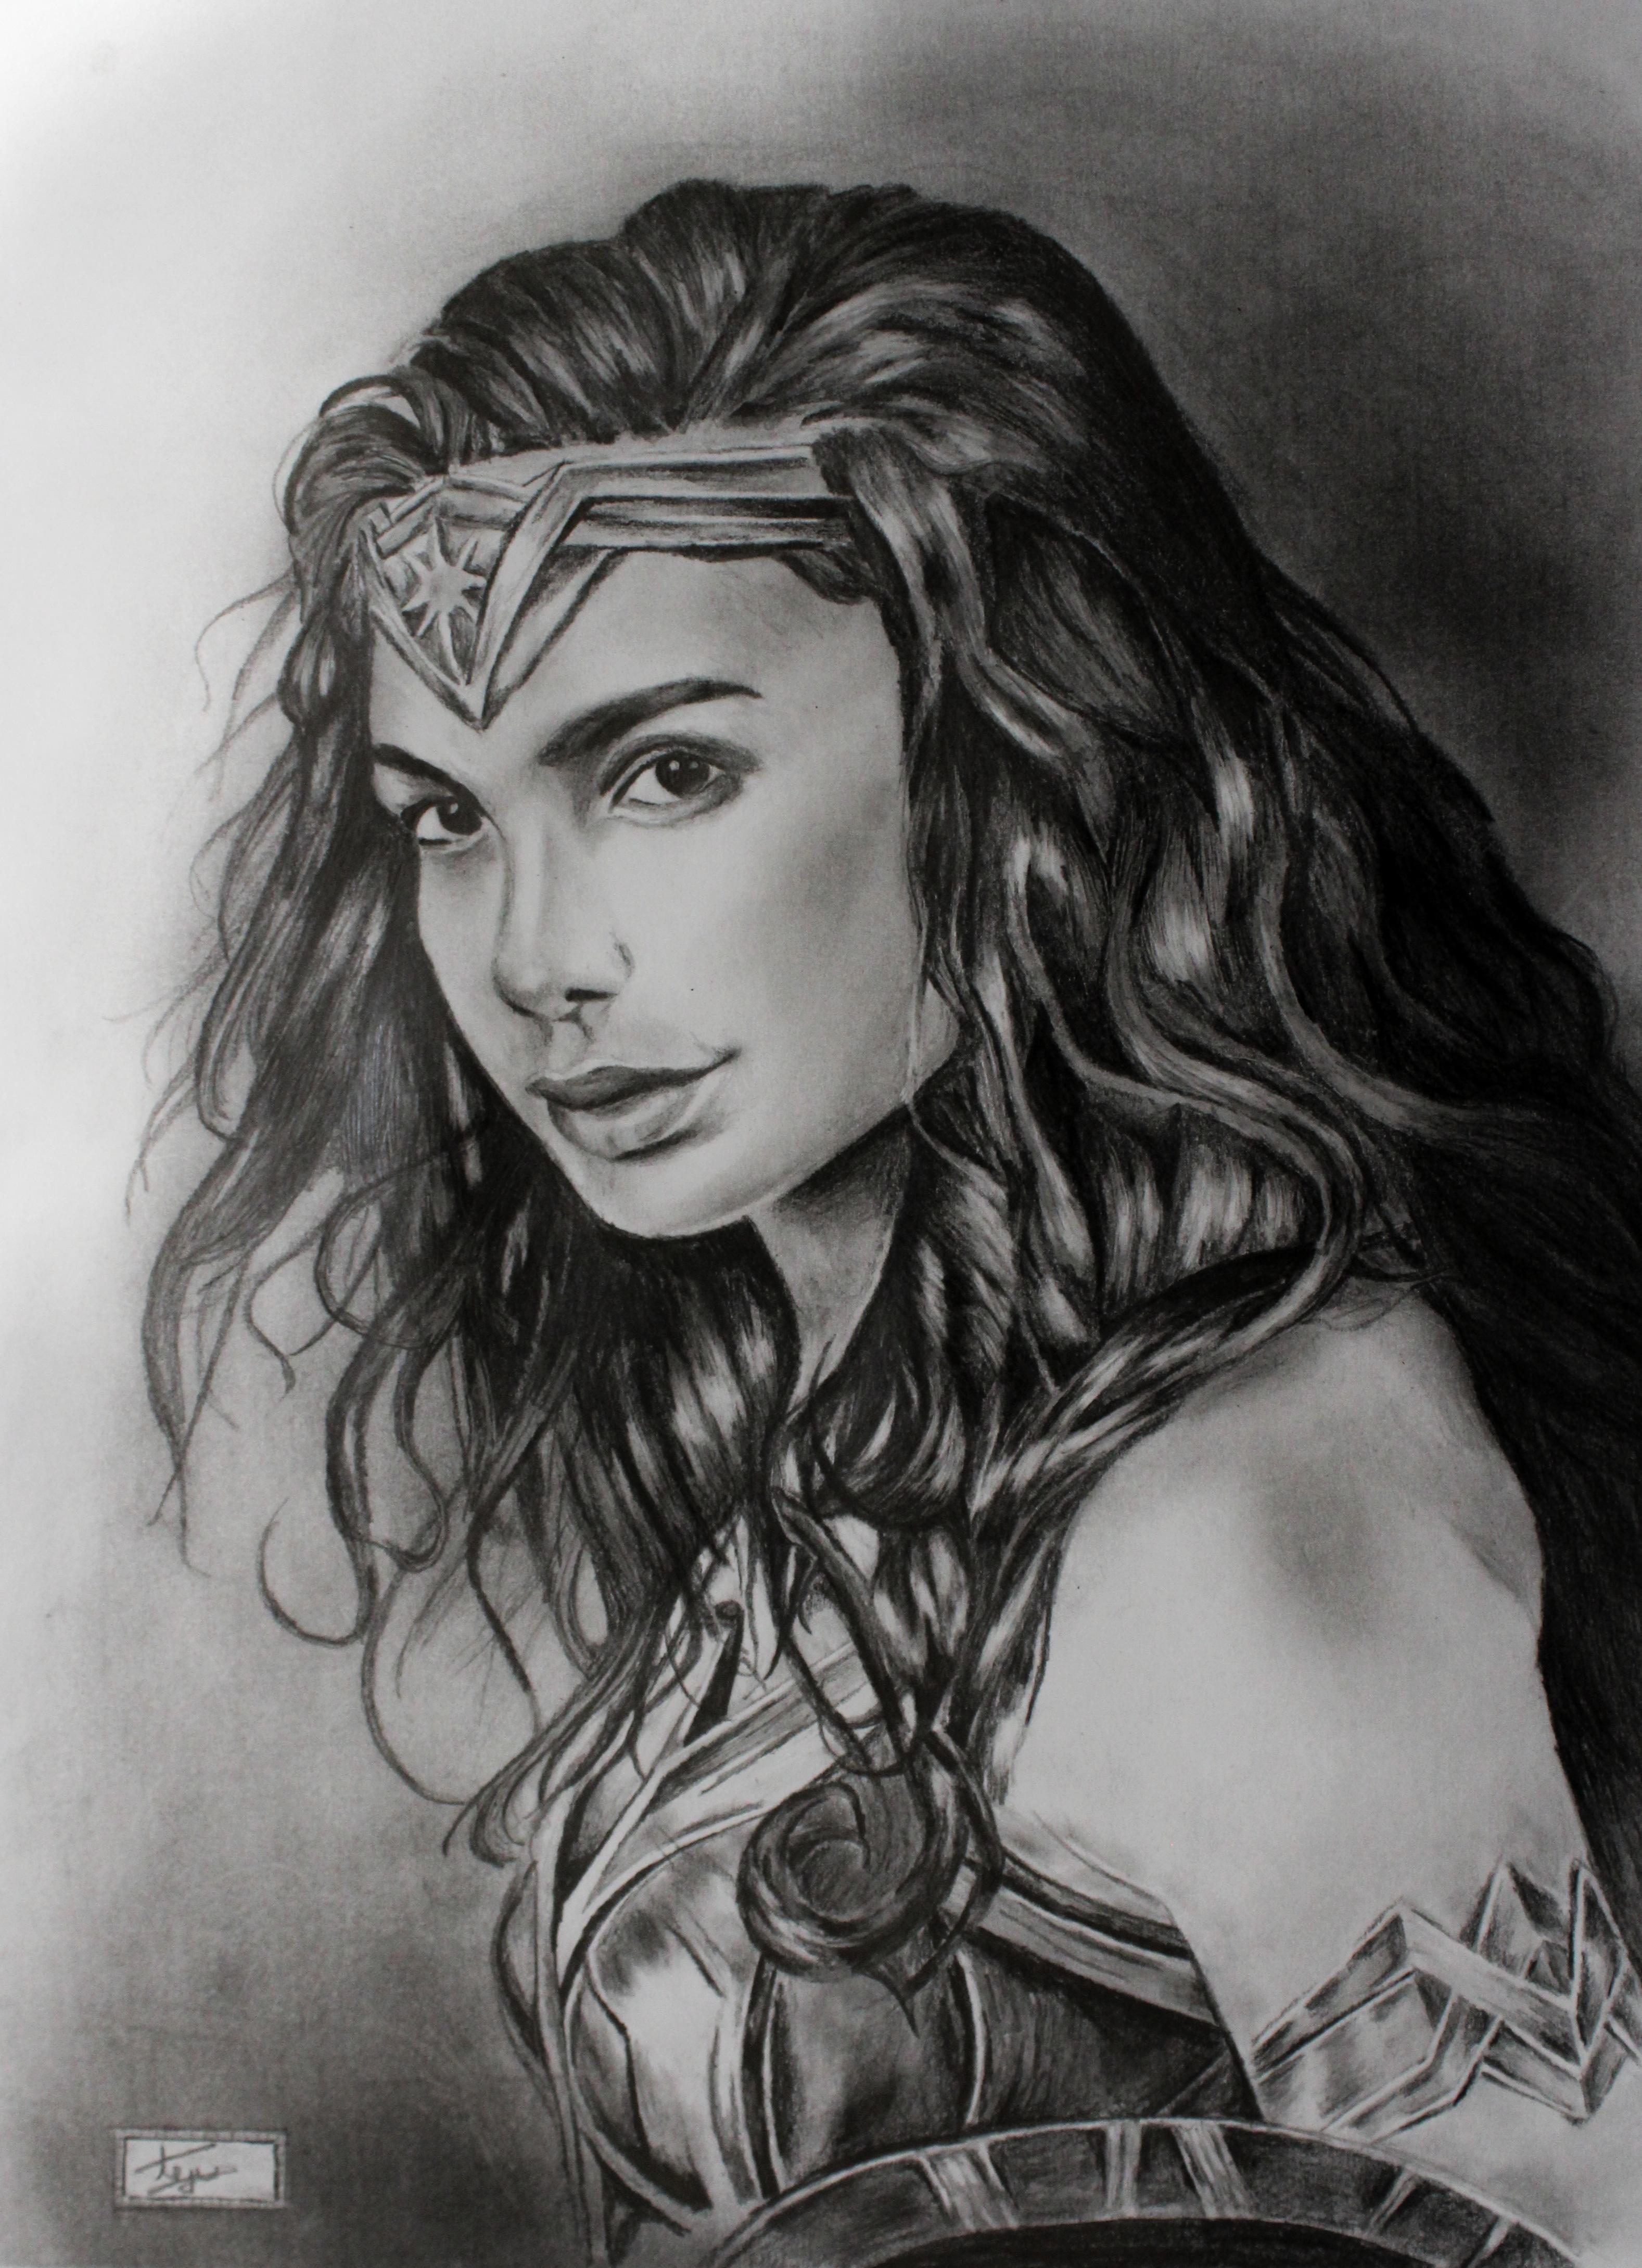 Woman Pencil Sketch : woman, pencil, sketch, Pencil, Sketch, Wonder, Woman., Share, Advice, Opinions, Drawing